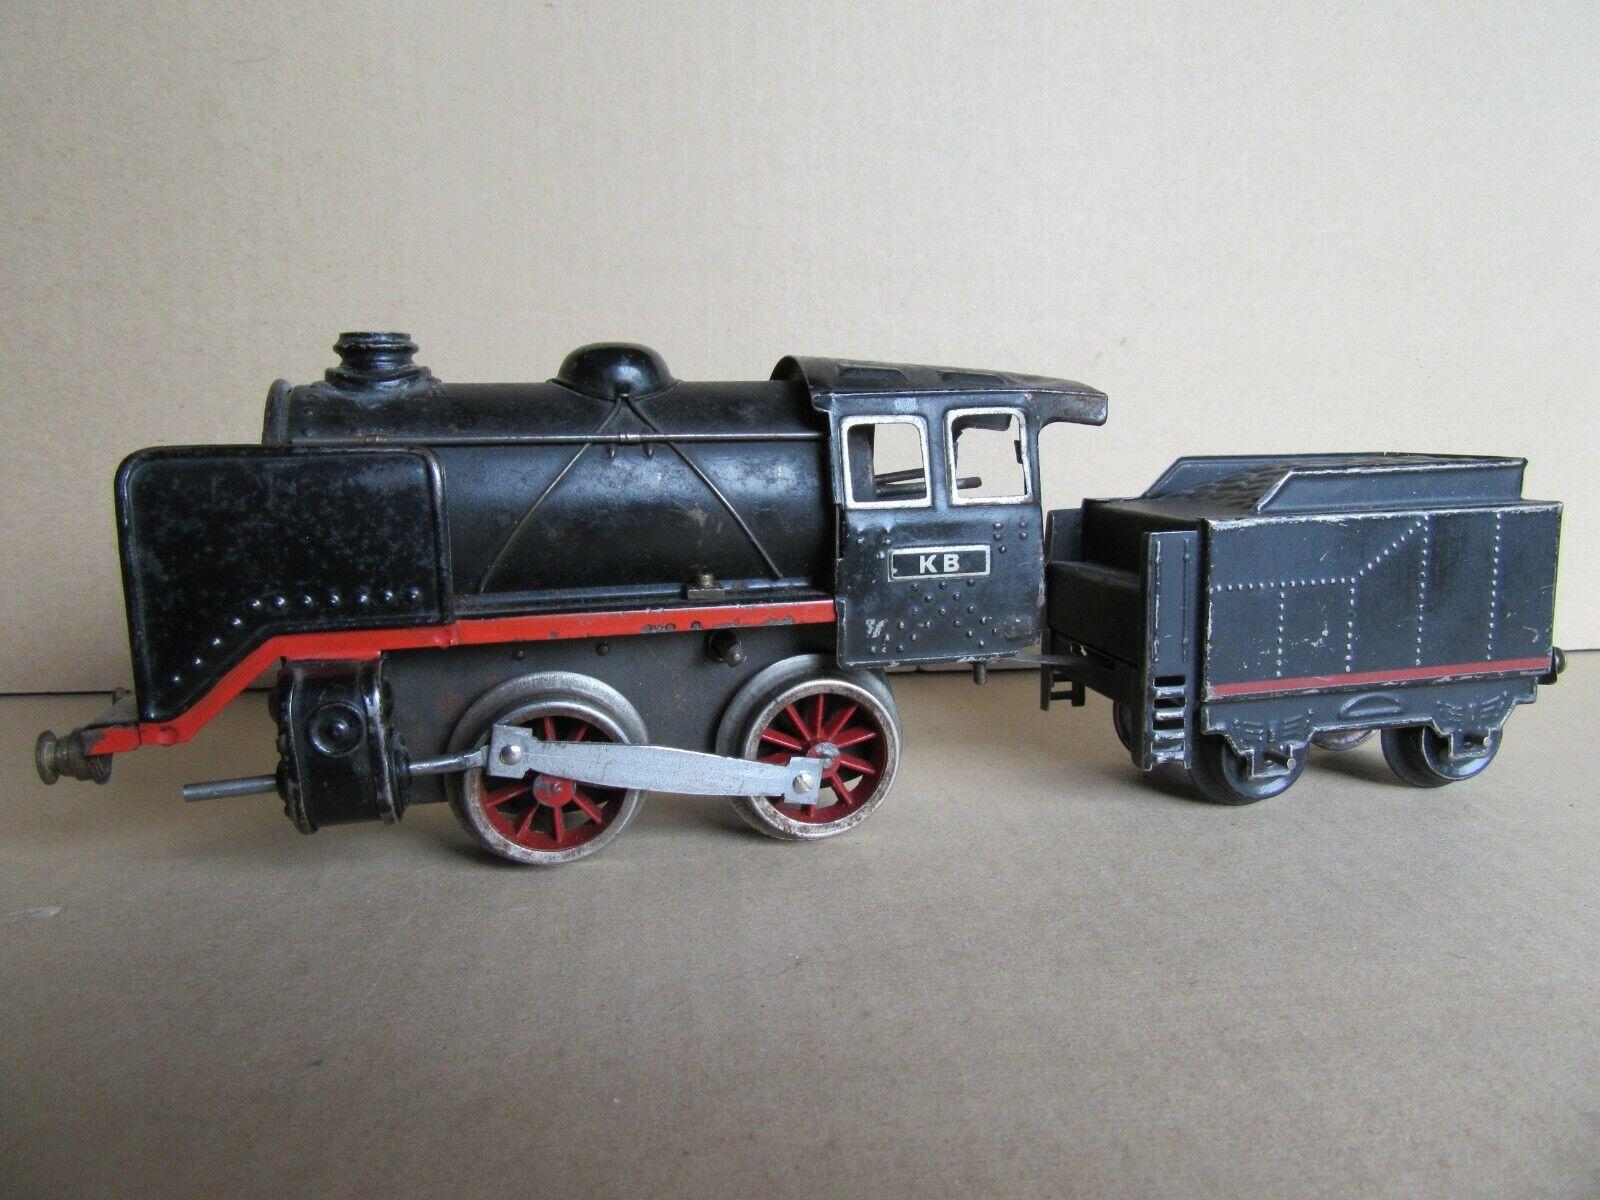 967I Vintage KB Karl Bub Locomotive Vapeur 4725R Zéro